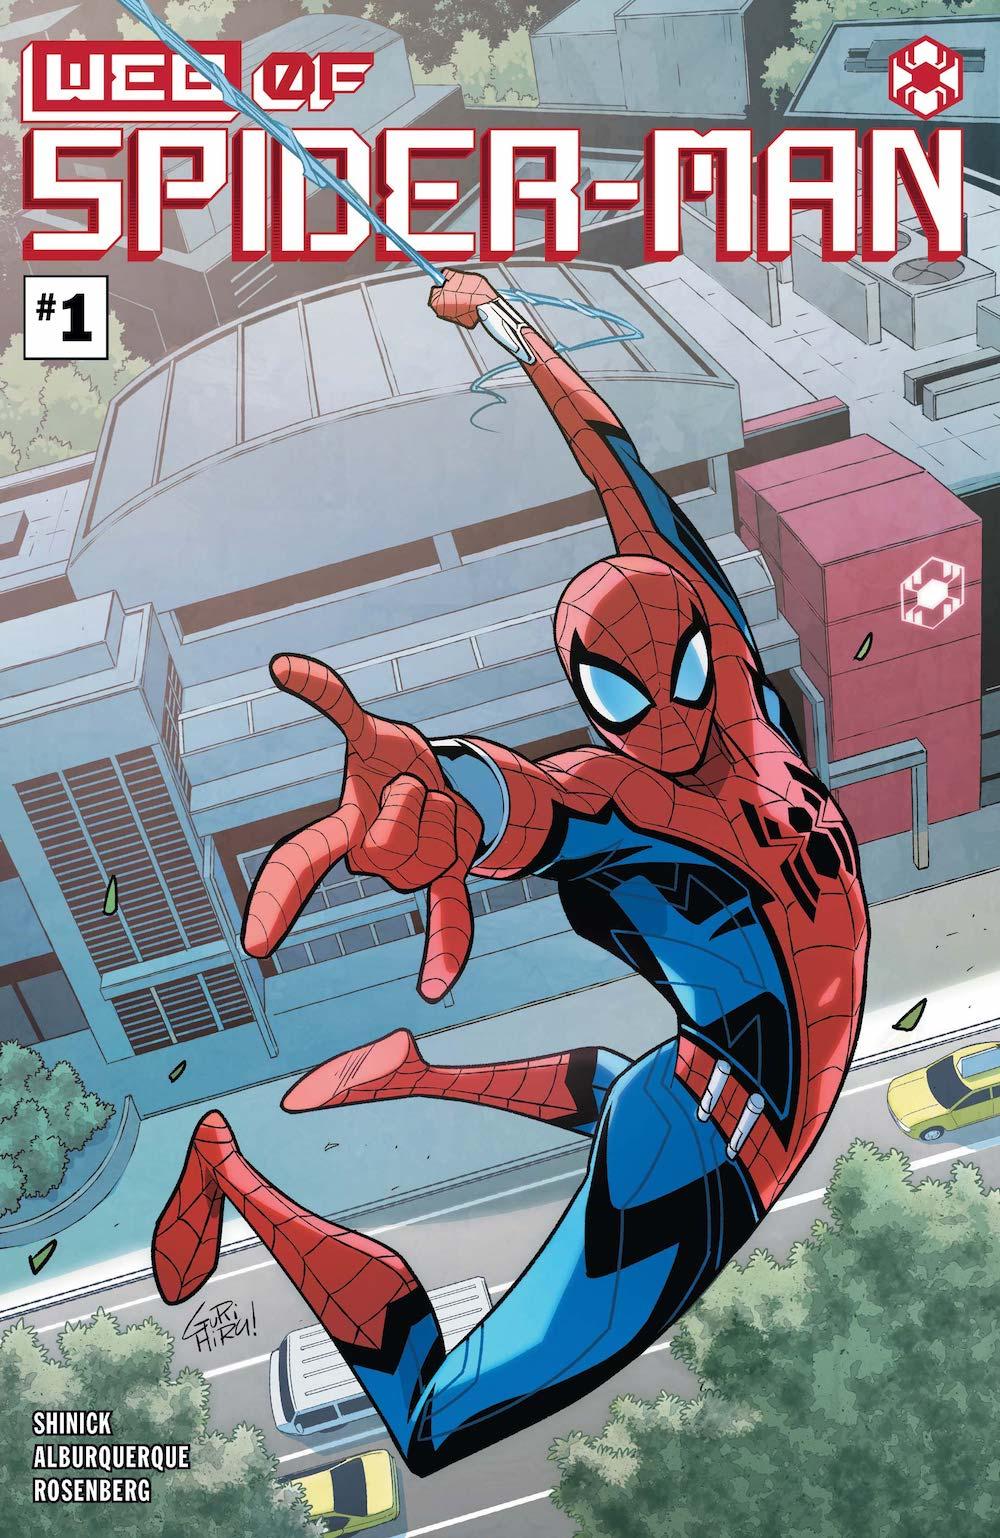 W.E.B. of Spider-Man #1 Cover by G Gurihiru